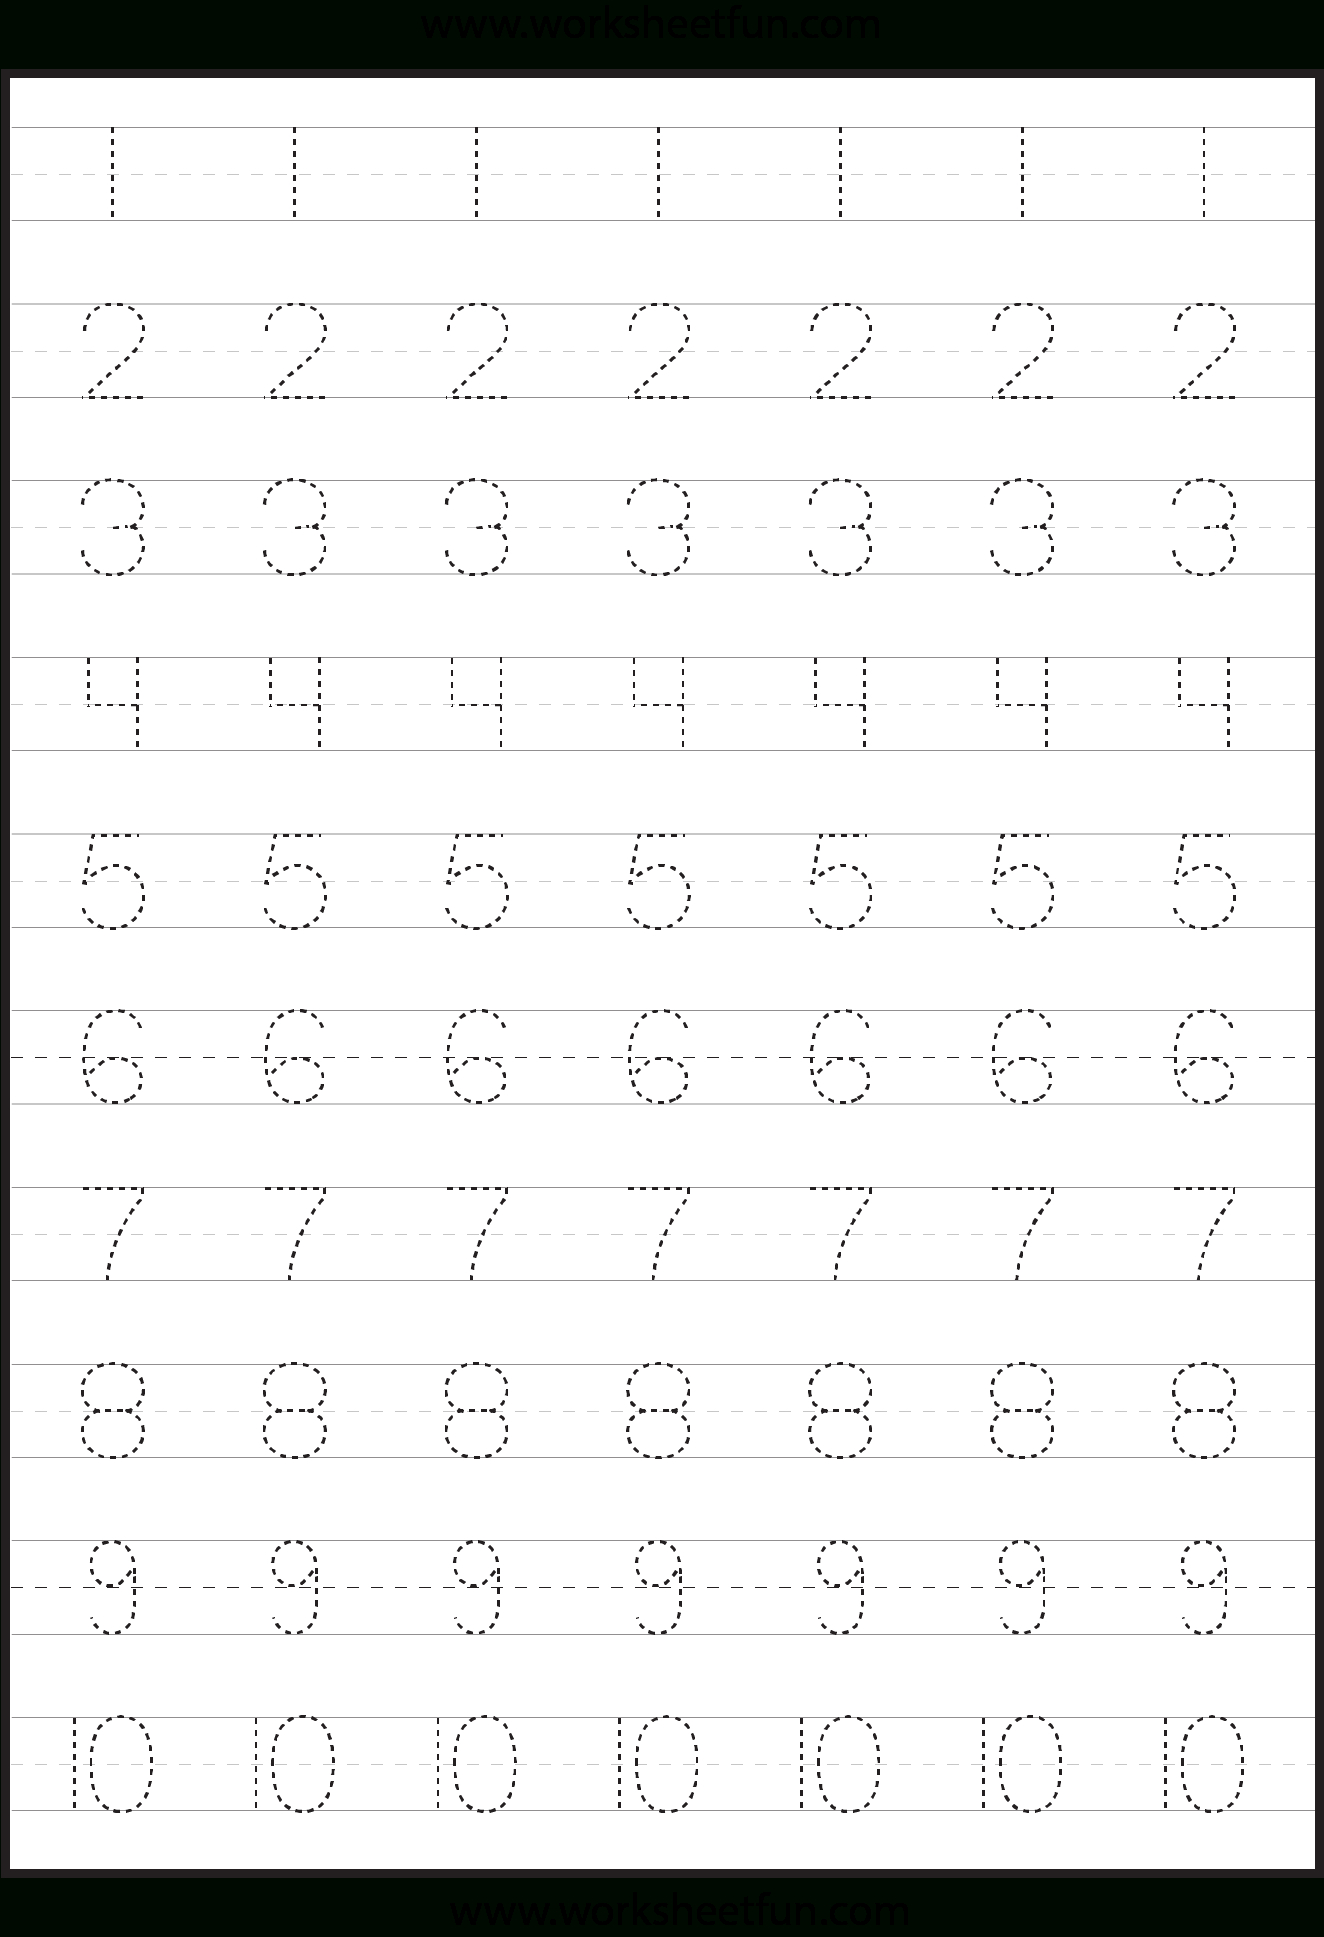 Number Tracing Worksheets For Kindergarten- 1-10 – Ten with regard to Tracing Letter 1